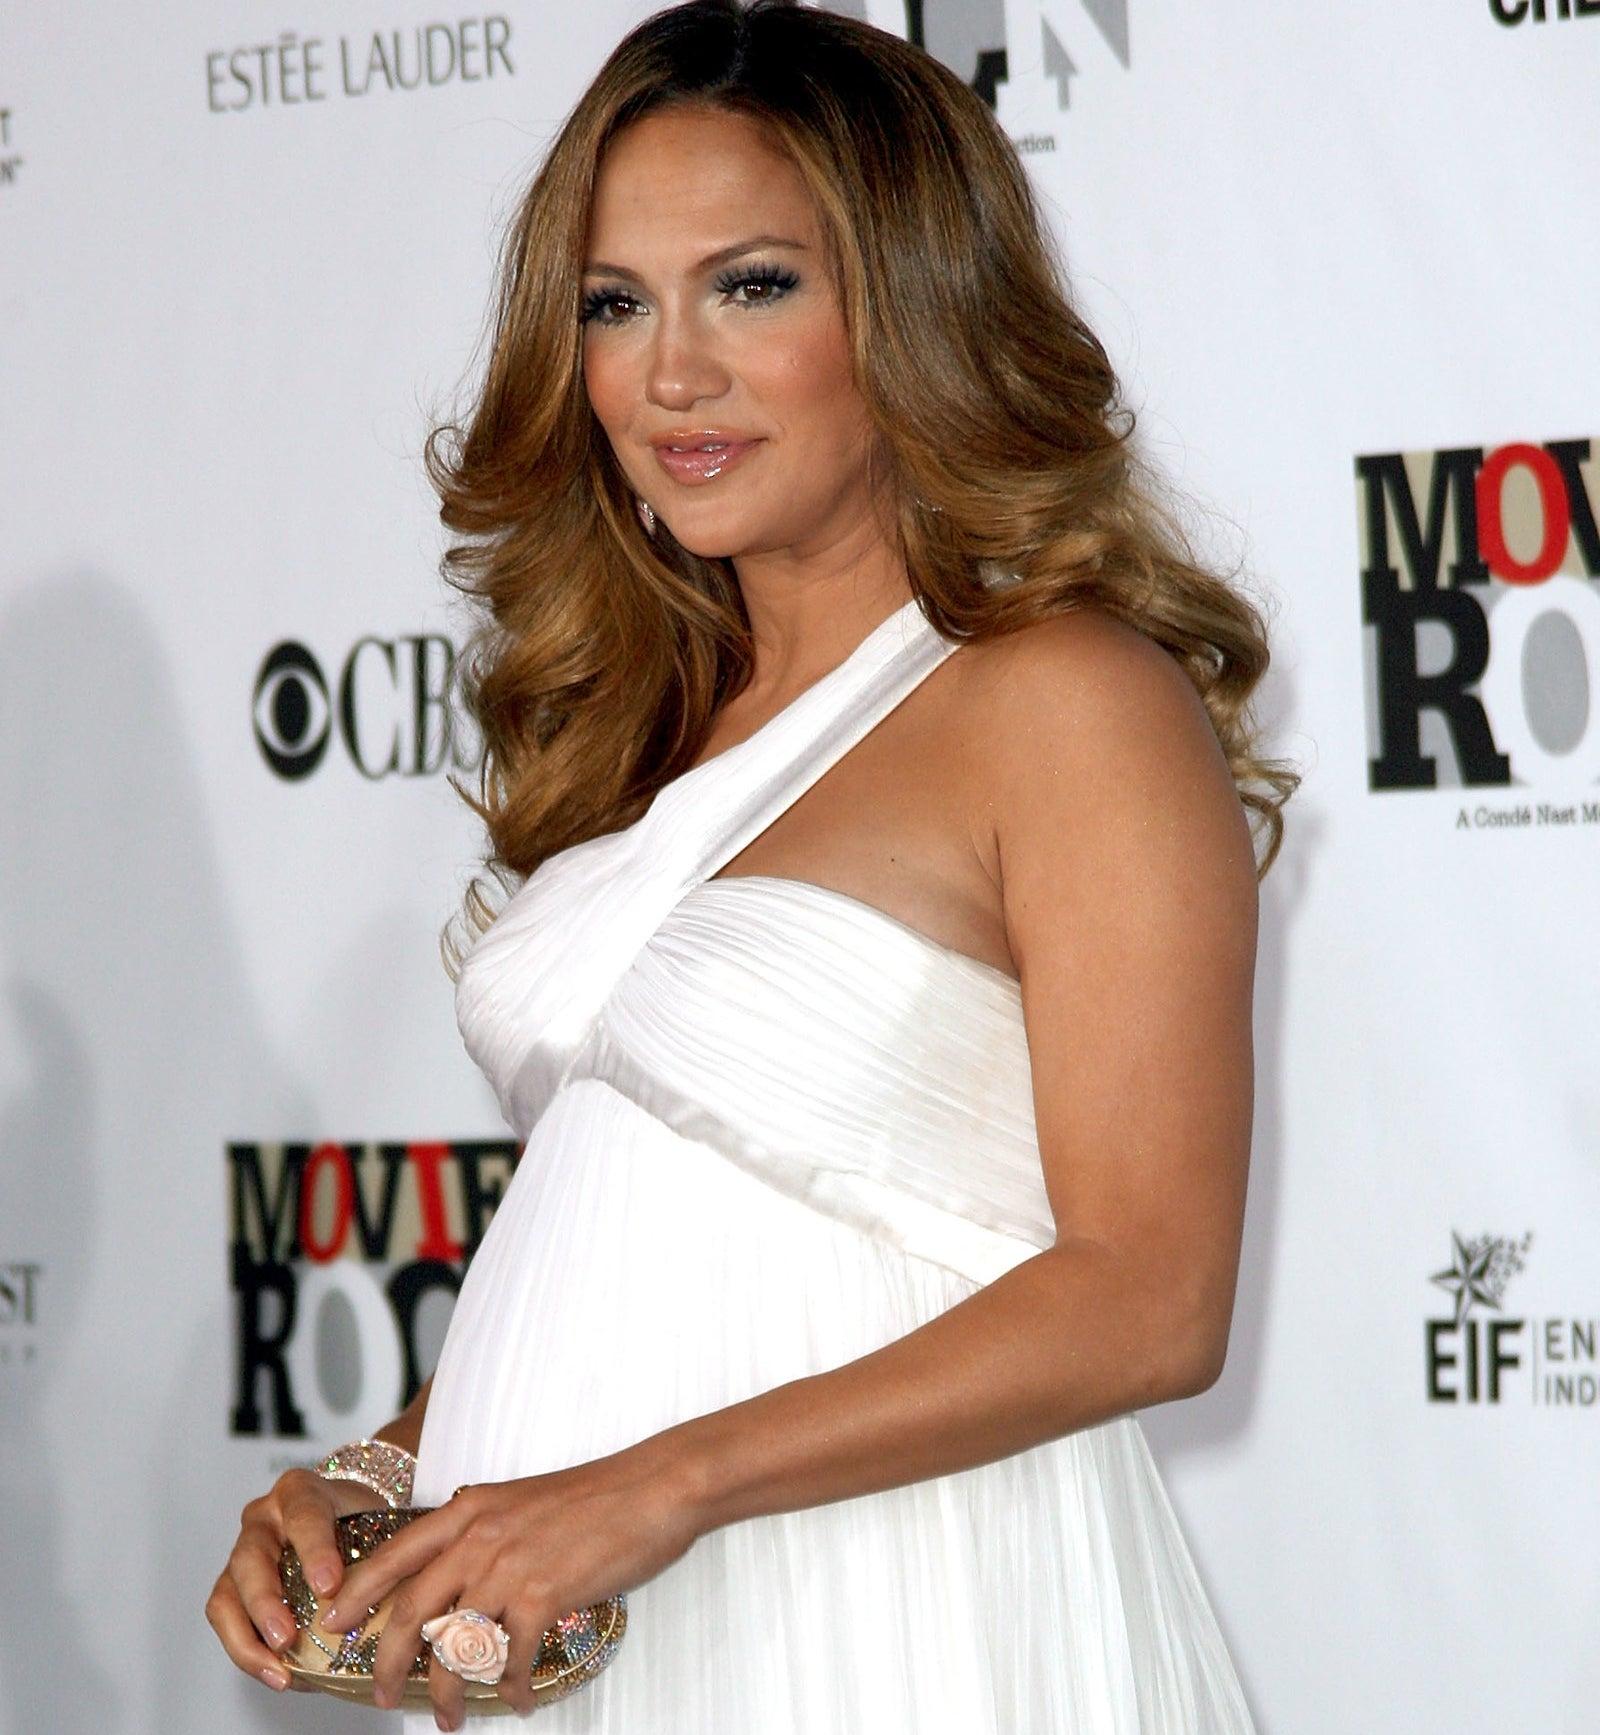 Jennifer Lopez gave birth to twins: son Maximilian David and daughter Emme Maribel.